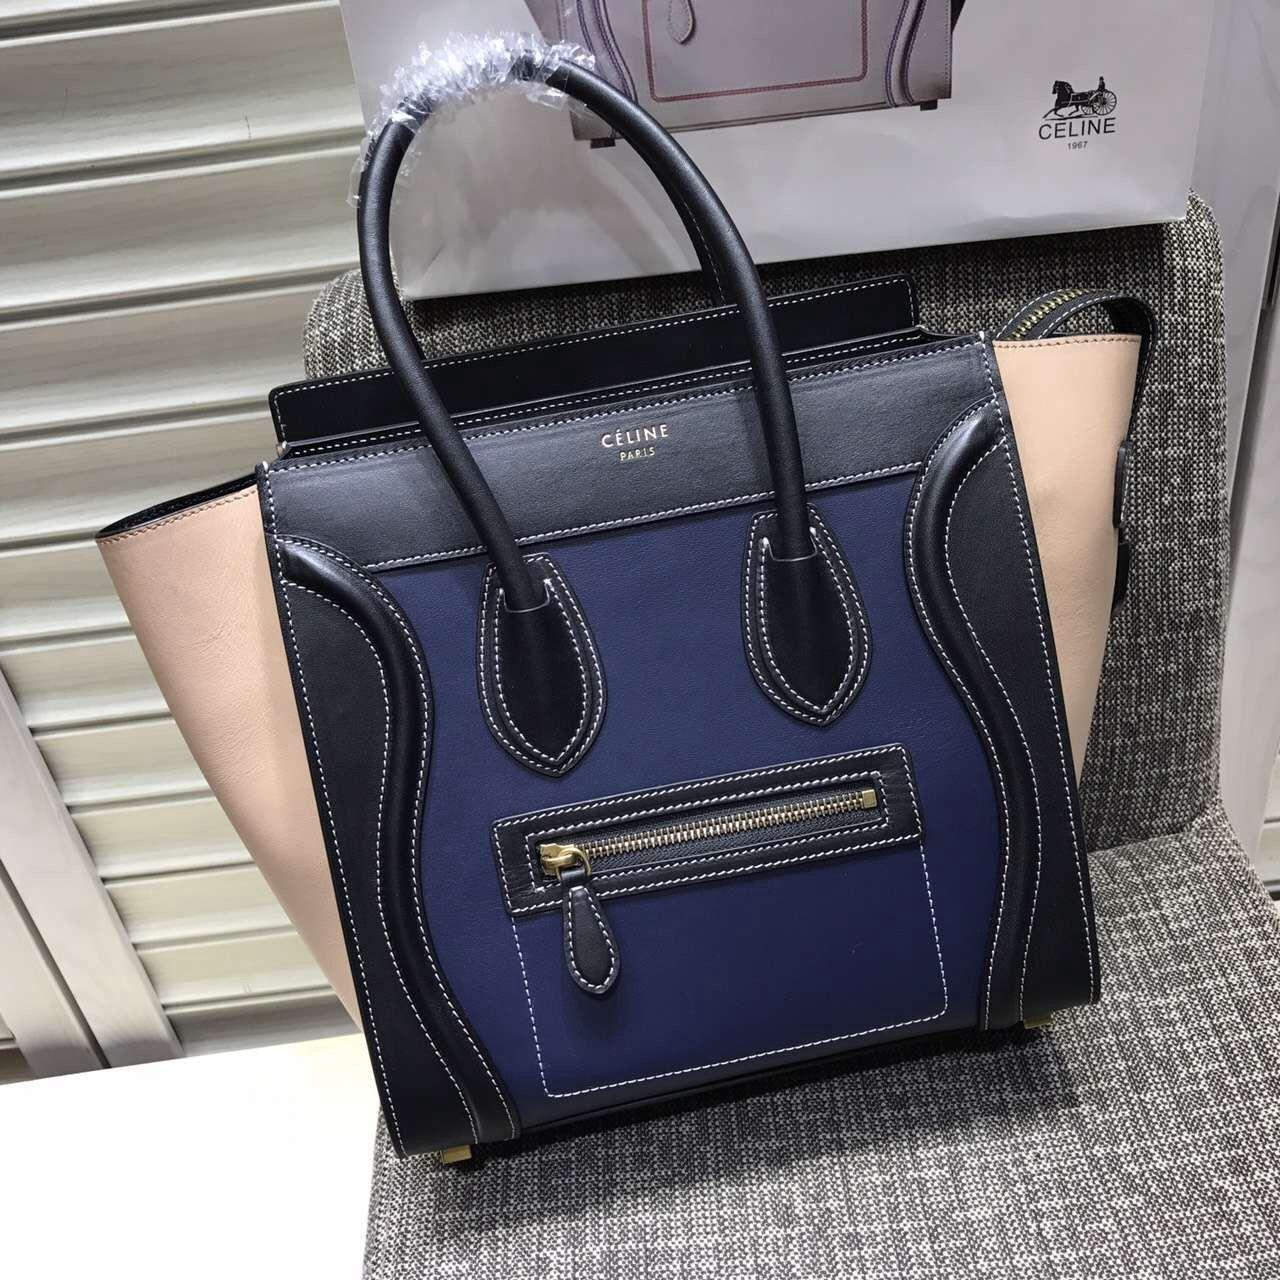 Celine Micro Luggage Handbag In Smooth Calfskin Black Navy Cameo 2016 93f6b3ae41d17